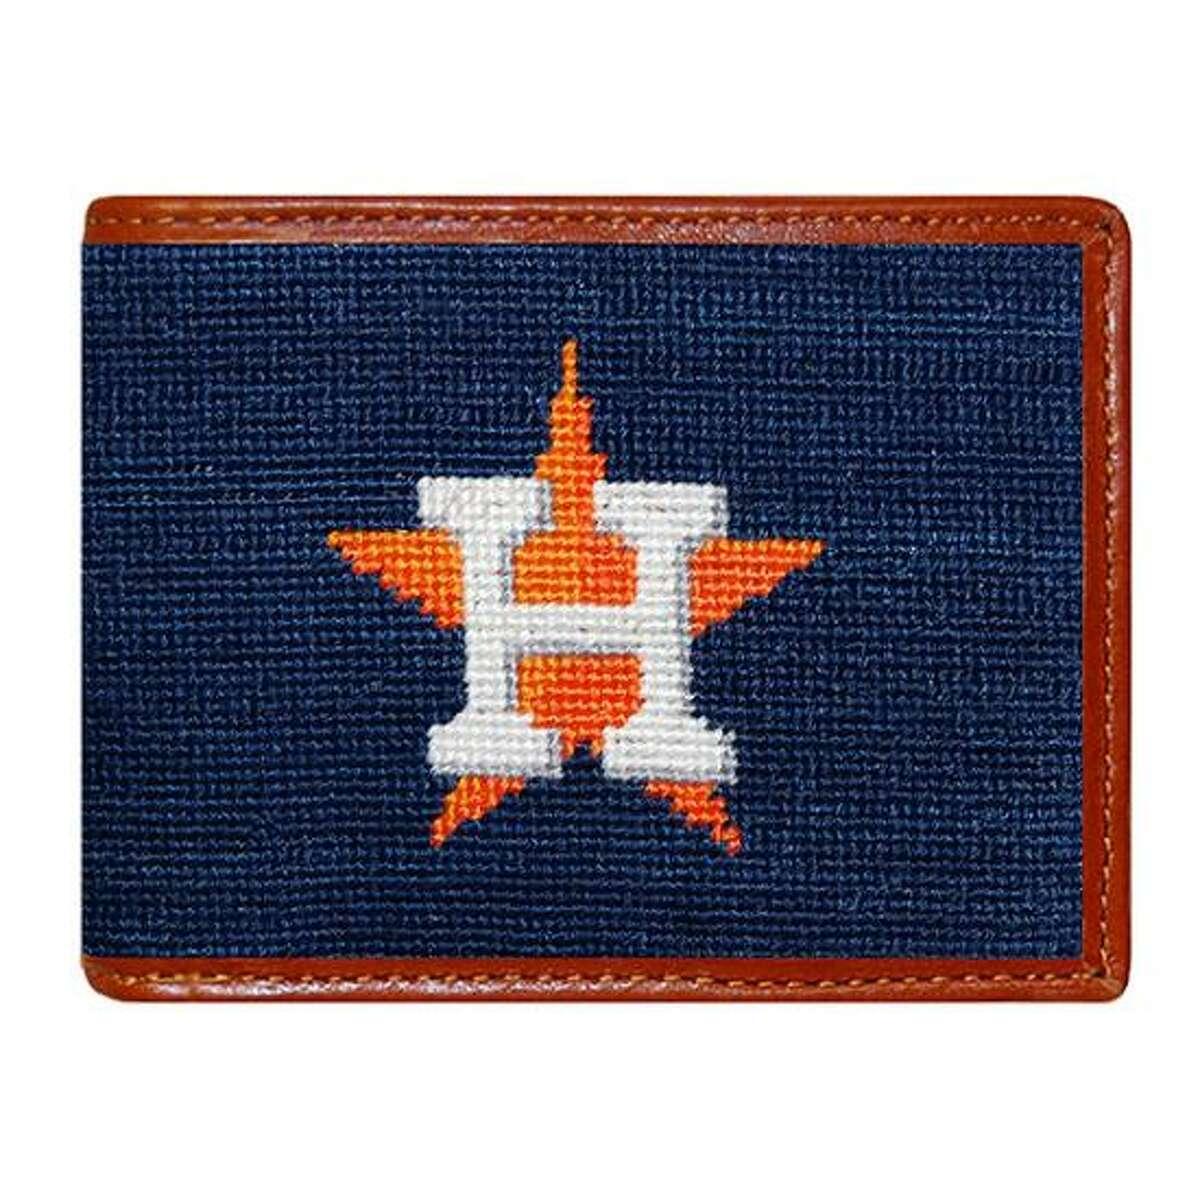 Houston Astros Needlepoint Bi-Fold Wallet; $115 at Paris Texas Apparel Co. or paristexasco.com